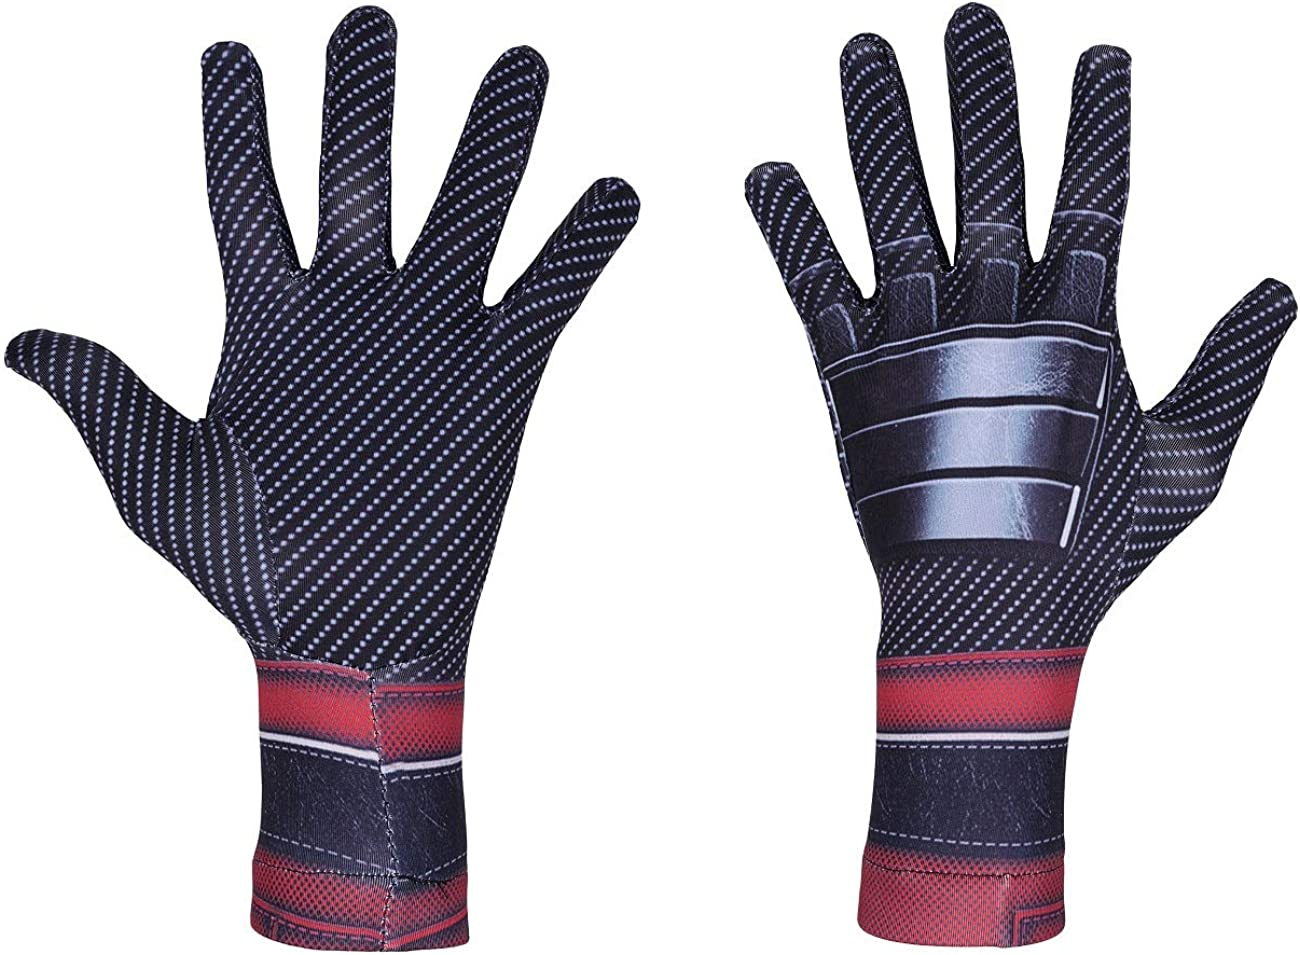 QJD Superhero Spider Gloves Adult Child Costume Accessories